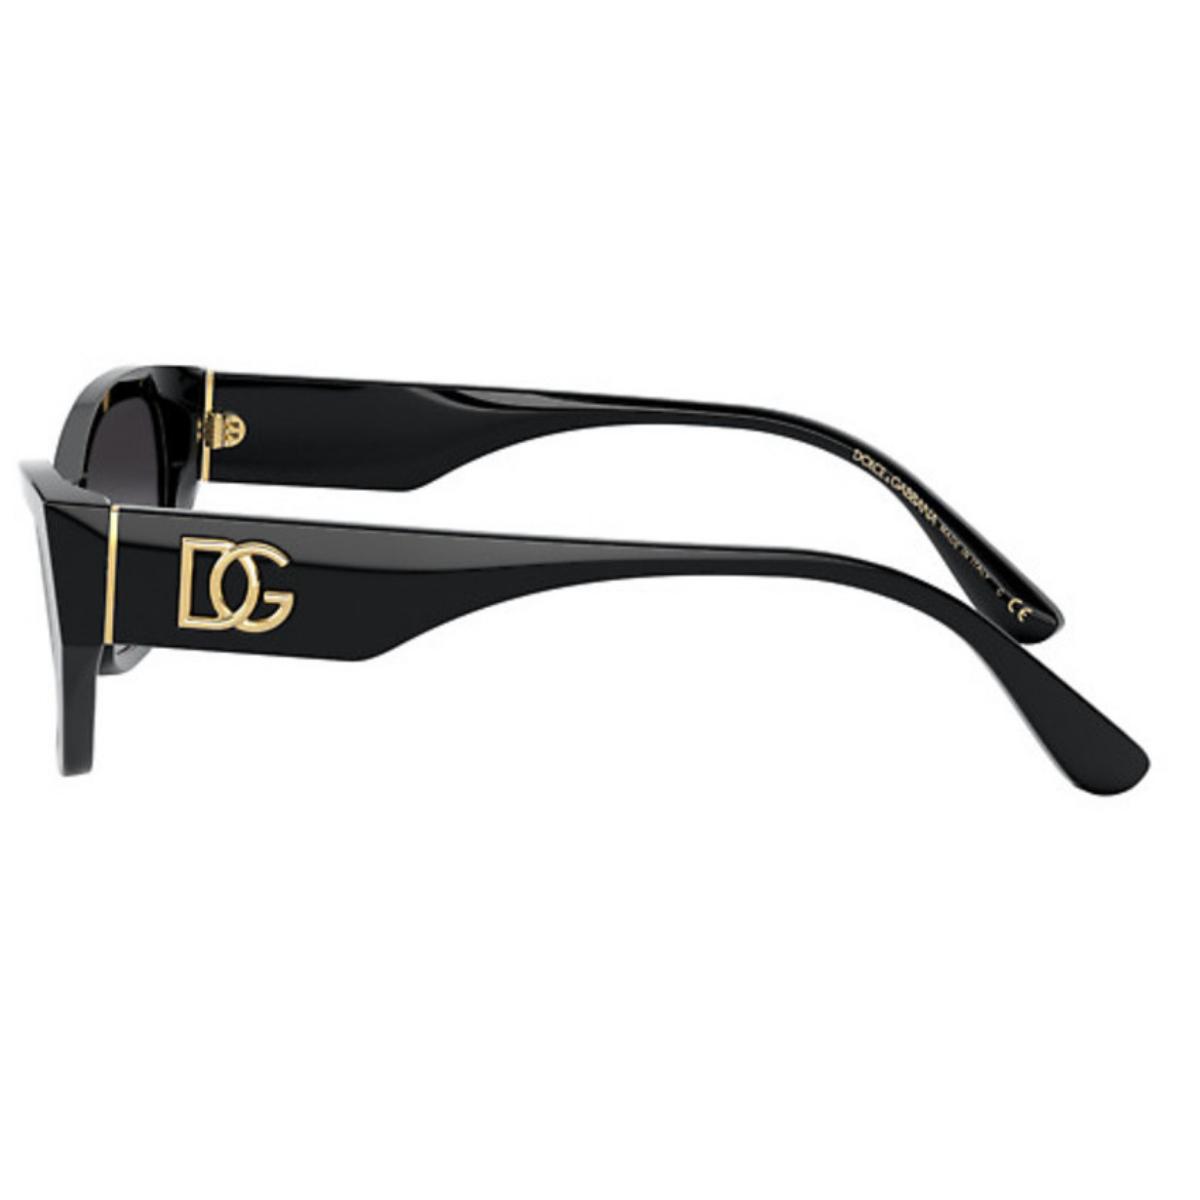 Óculos de Sol Feminino Dolce & Gabbana DG 4375